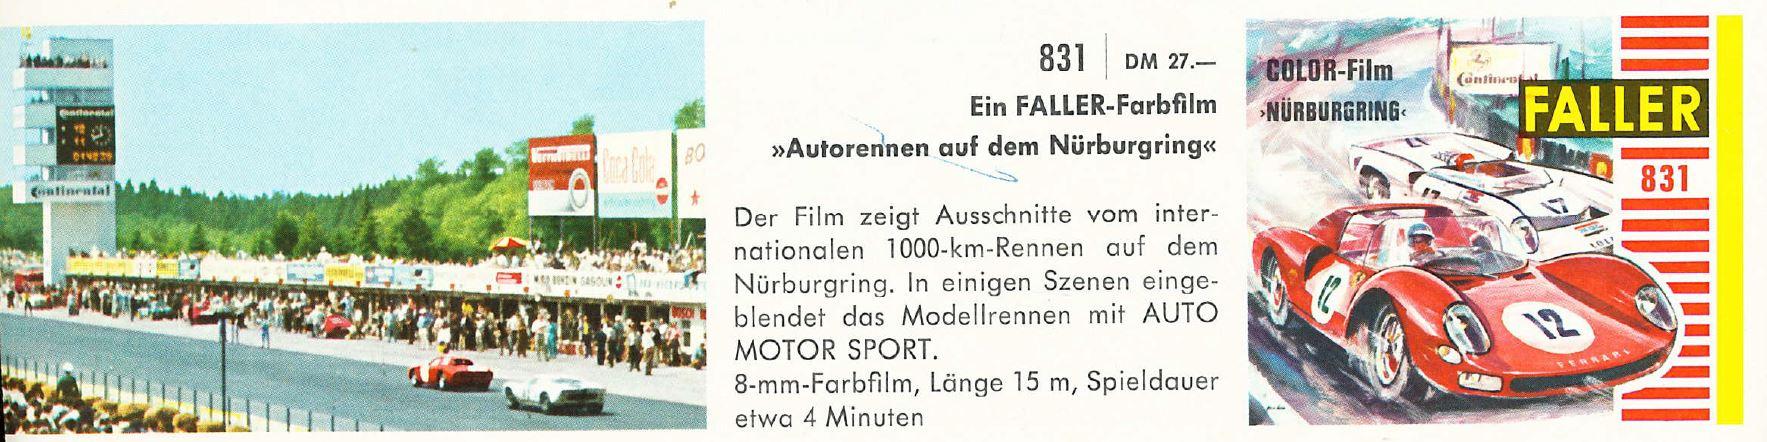 008-jahreskatalog-1967-b-faller-831-farbfilm